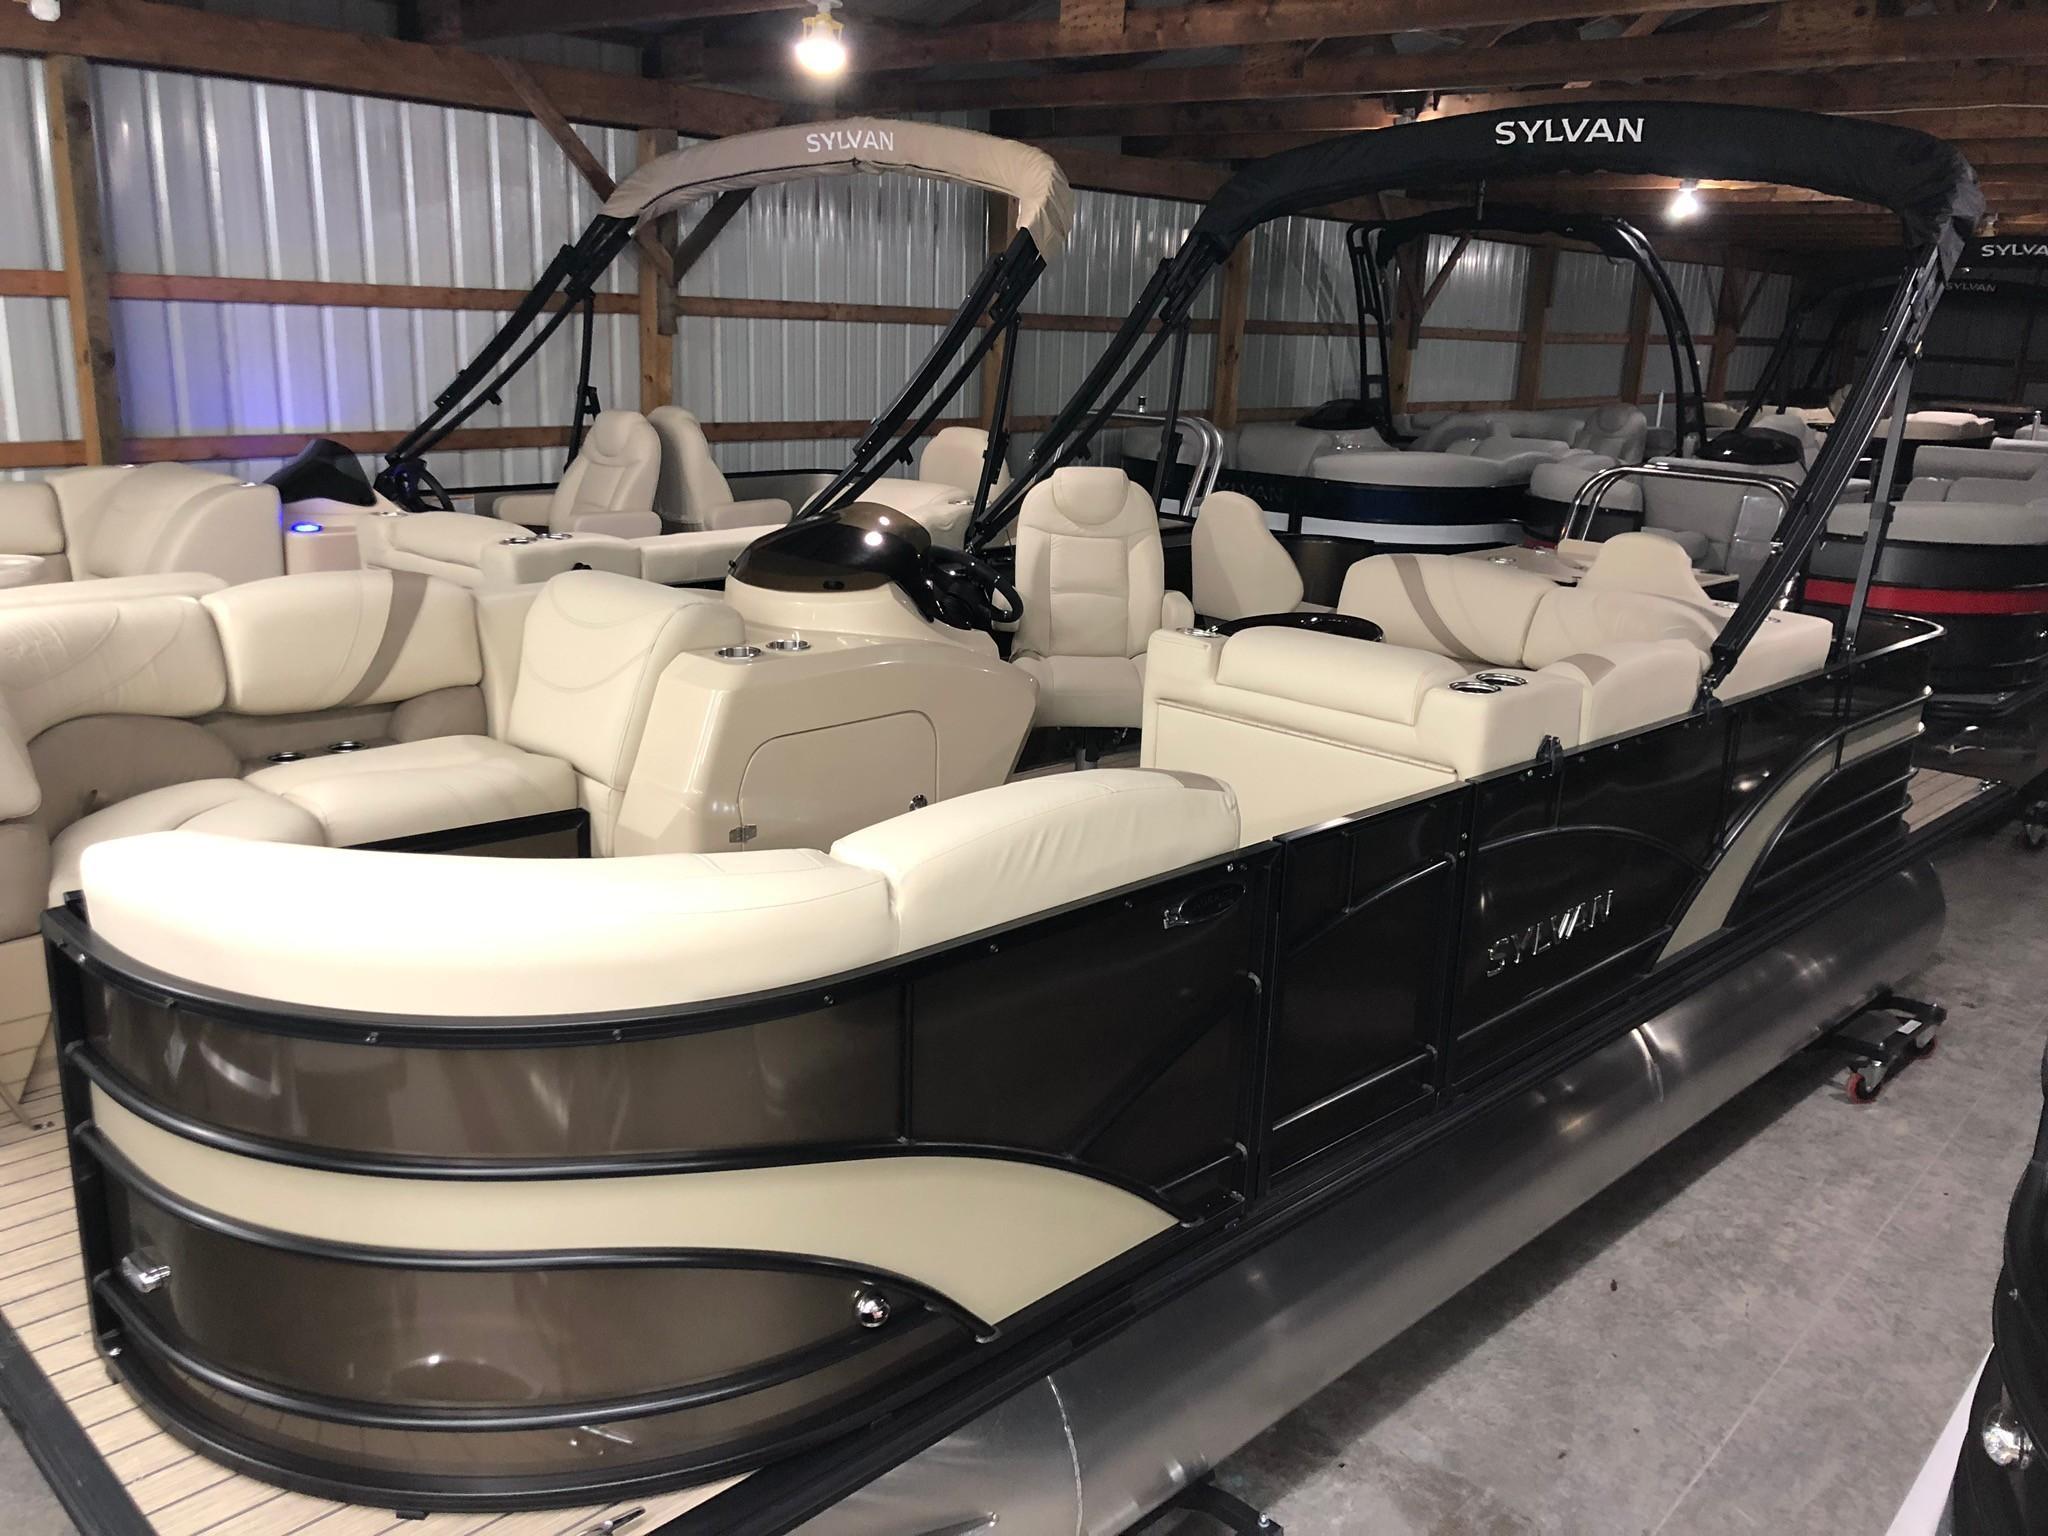 Sylvan 8520 Cruise N Fish LE